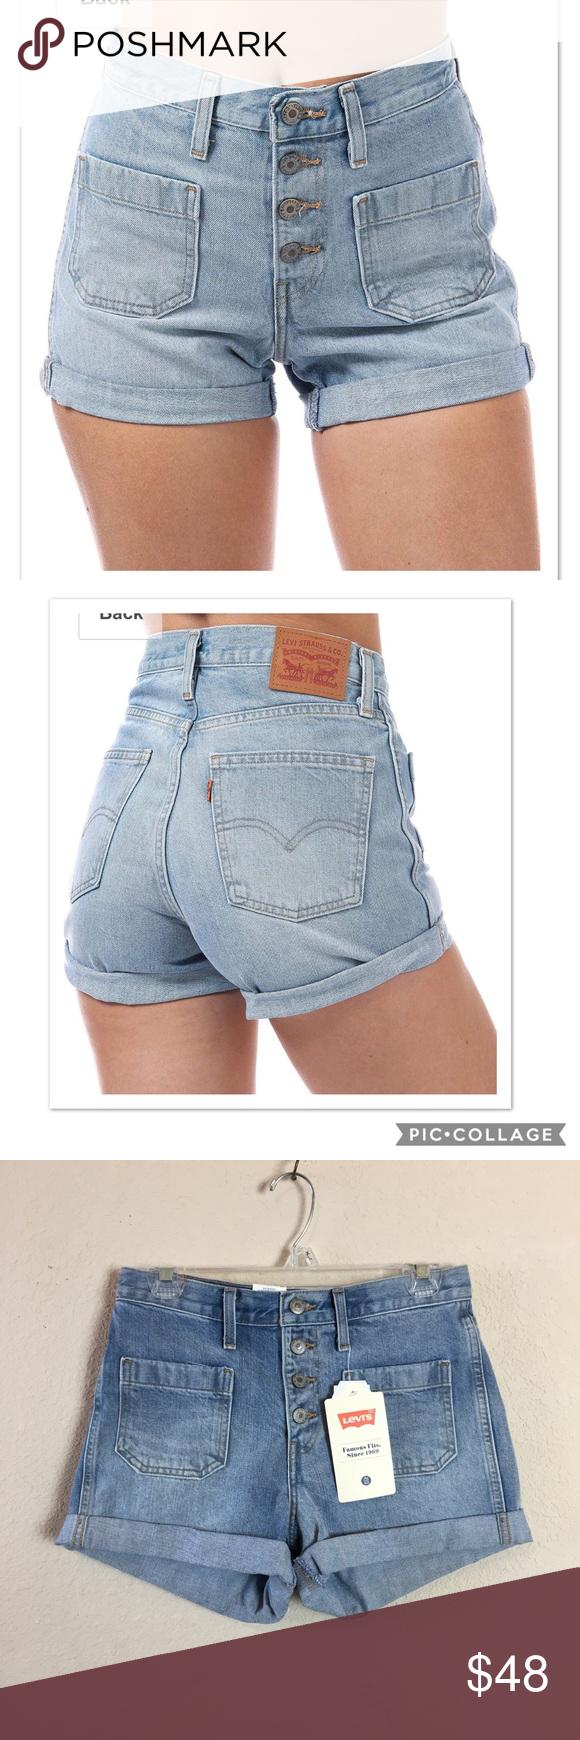 f435aa6f Levi's Orange Tab 5 Button Shorts in Kerouac NWT! Levi's Orange Tab Shorts  in Kerouac